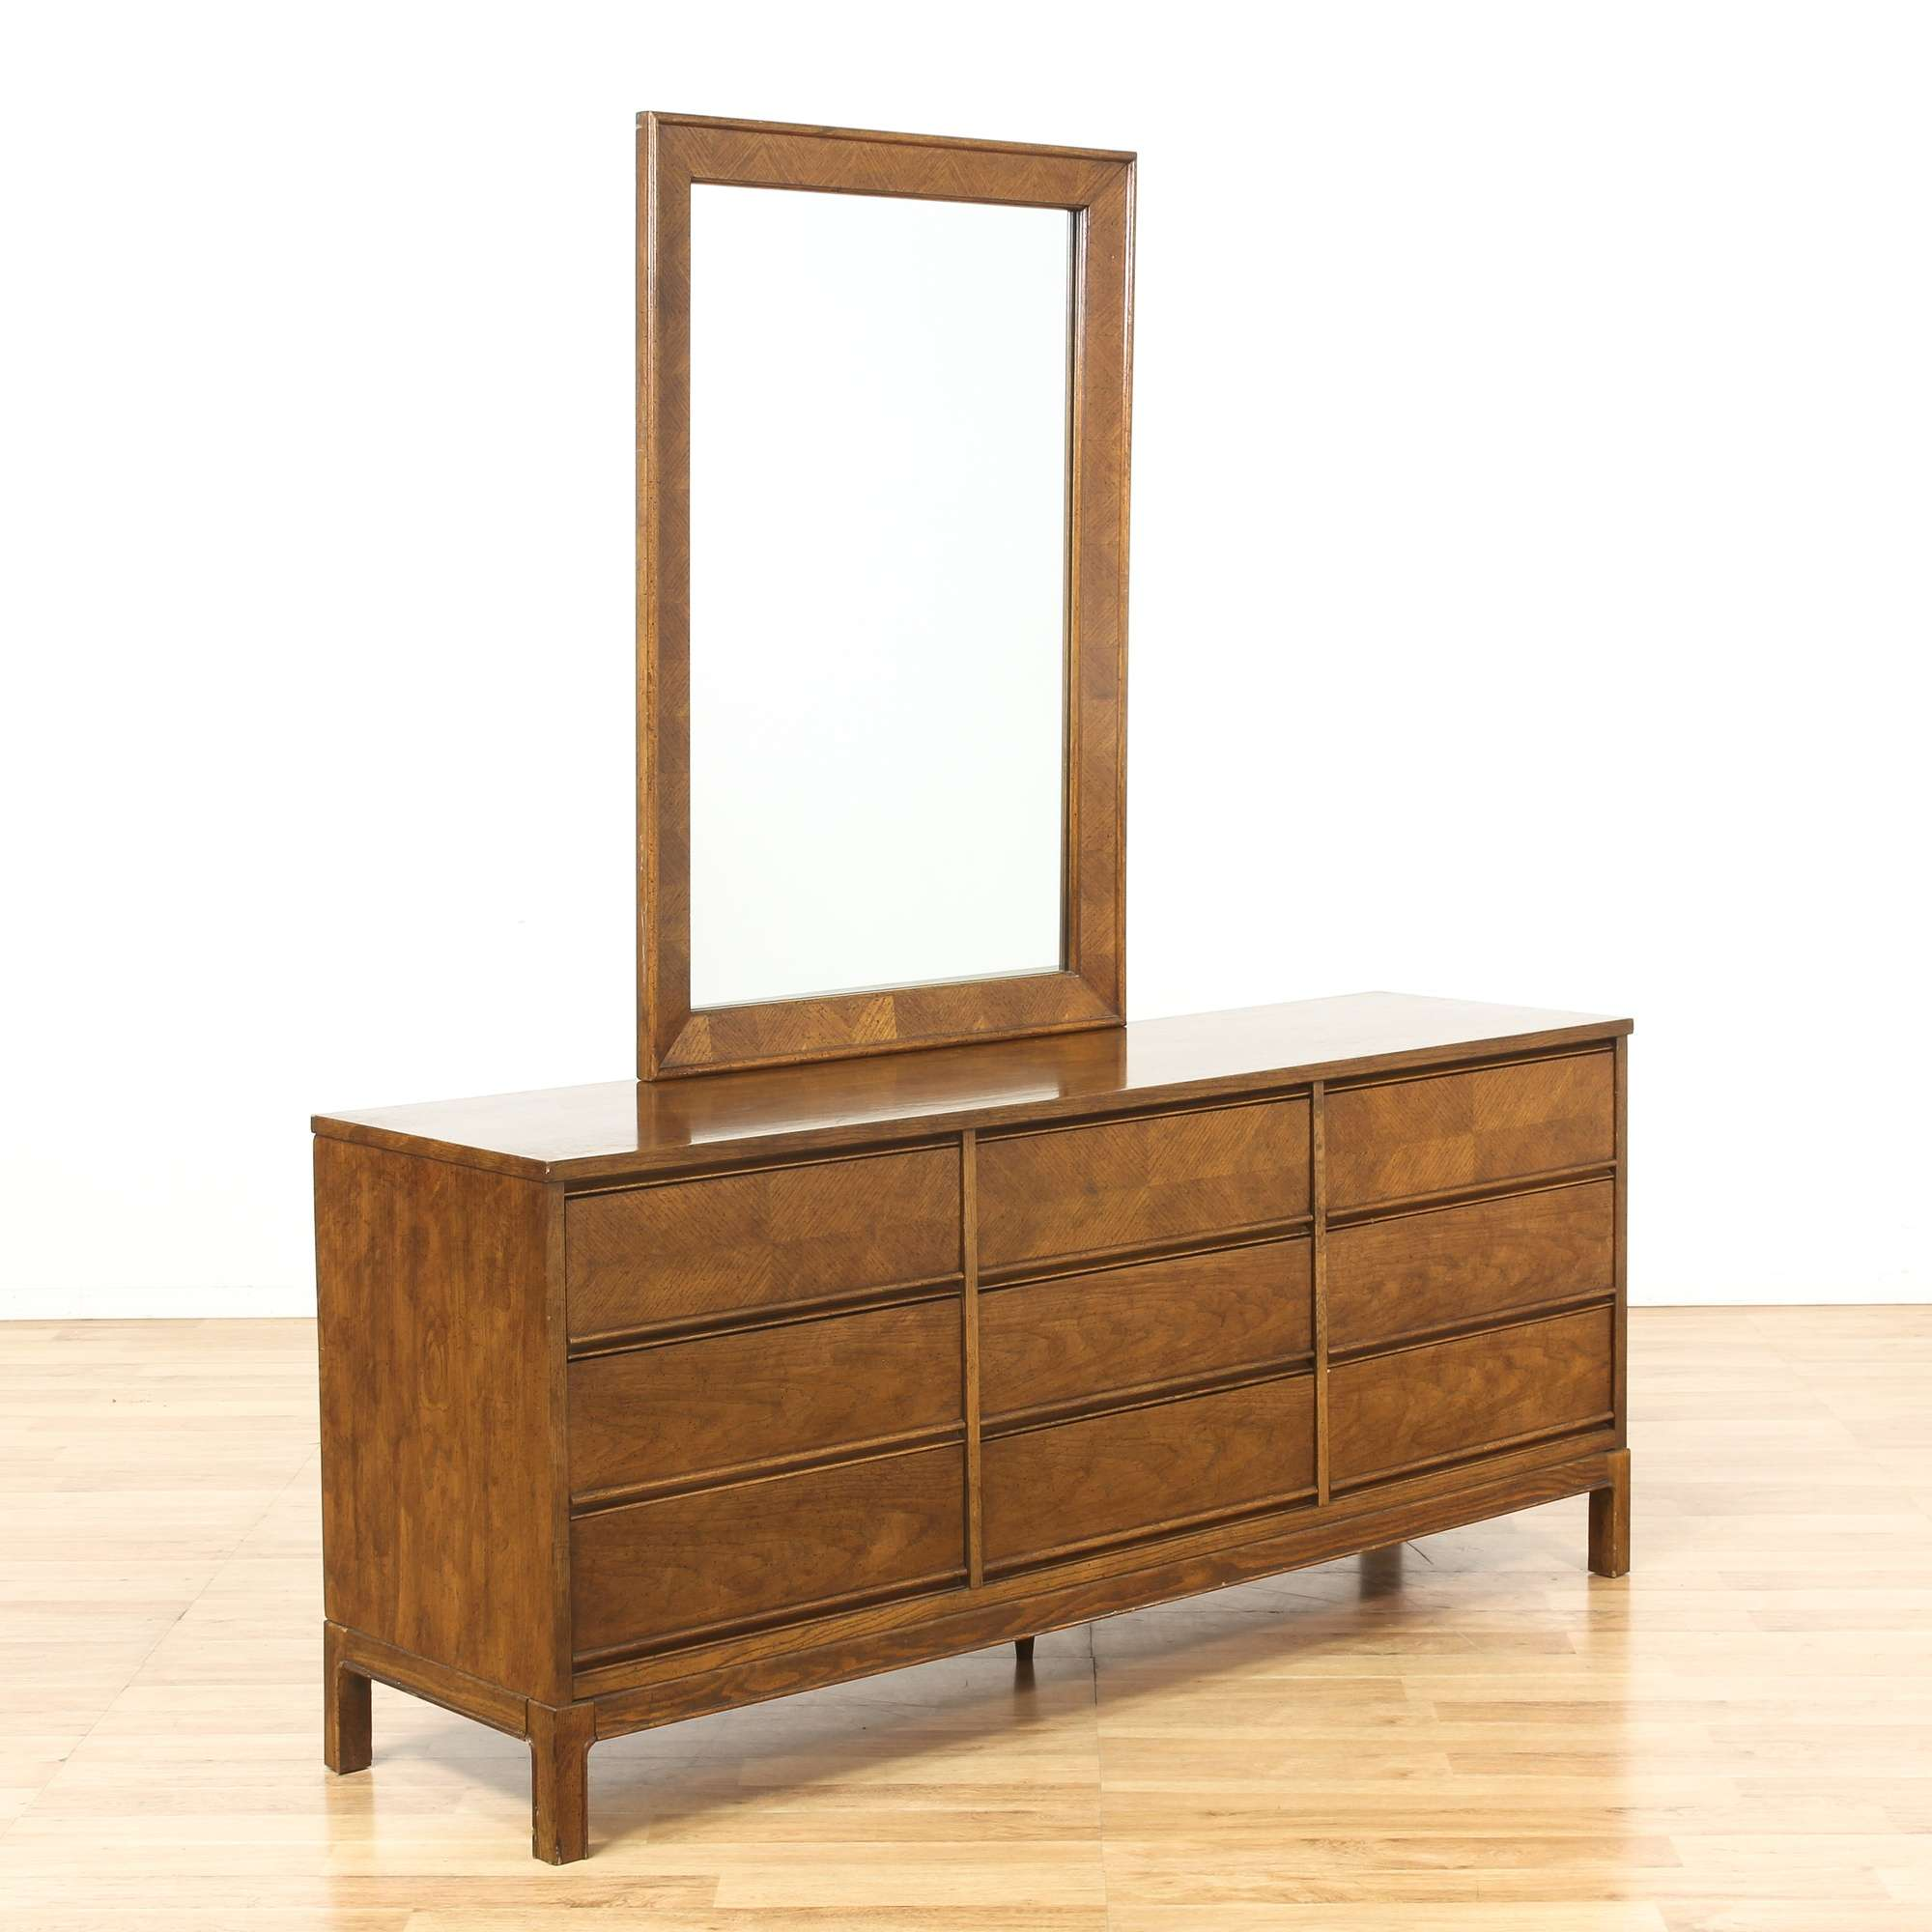 Image of: Dixie Mid Century Modern 9 Drawer Dresser W Mirror Loveseat Online Auctions Los Angeles